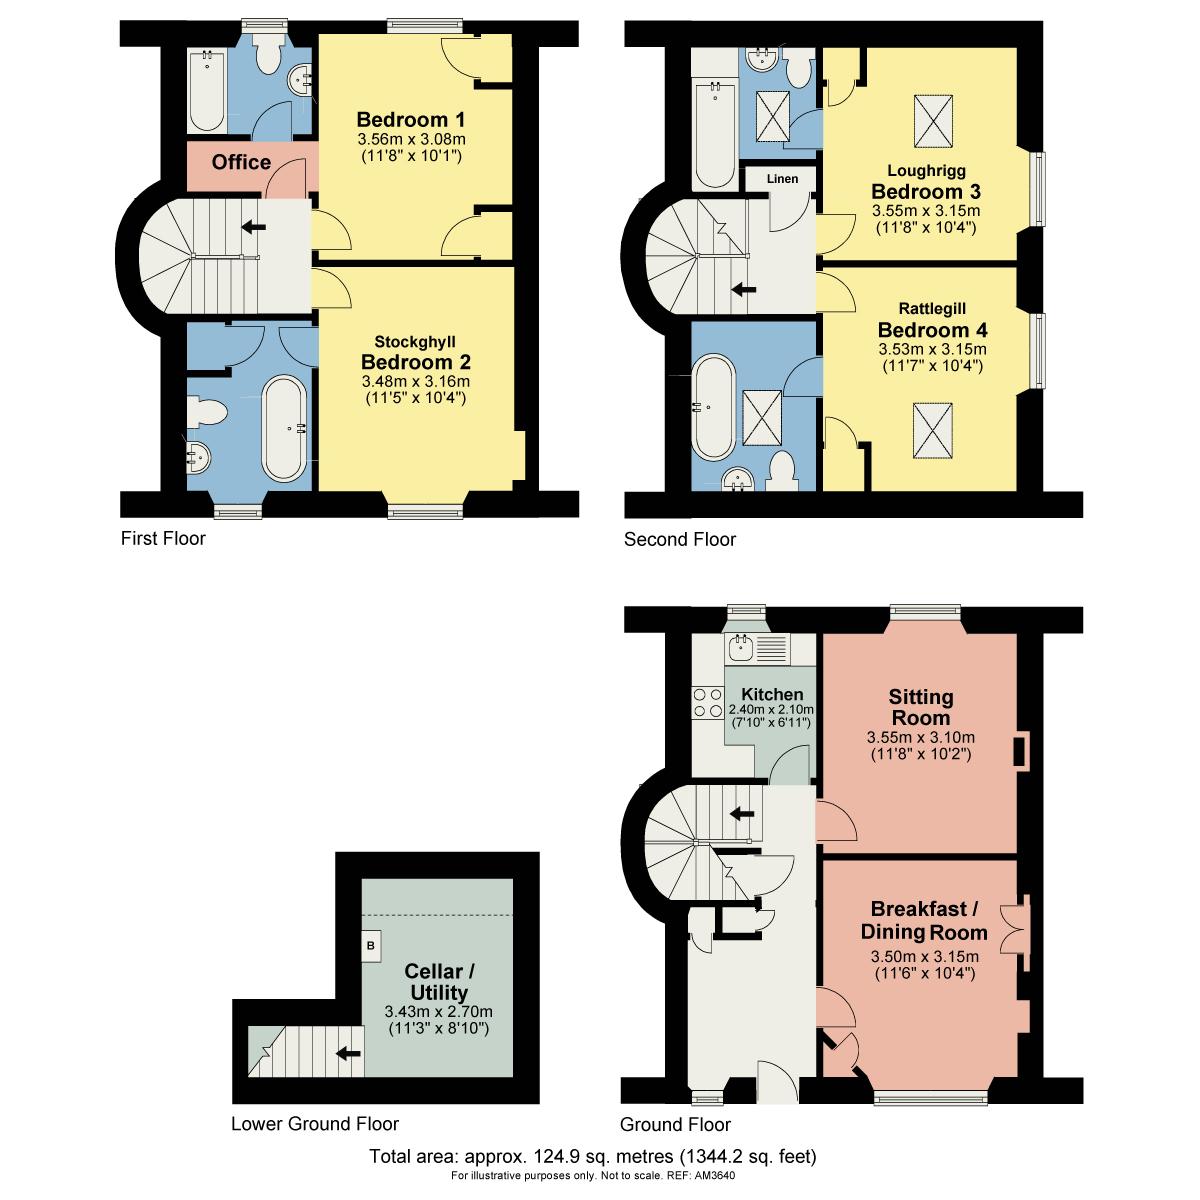 Floorplan The Waterwheel Guesthouse, 3 Bridge Street, Ambleside, Cumbria LA22 9DU